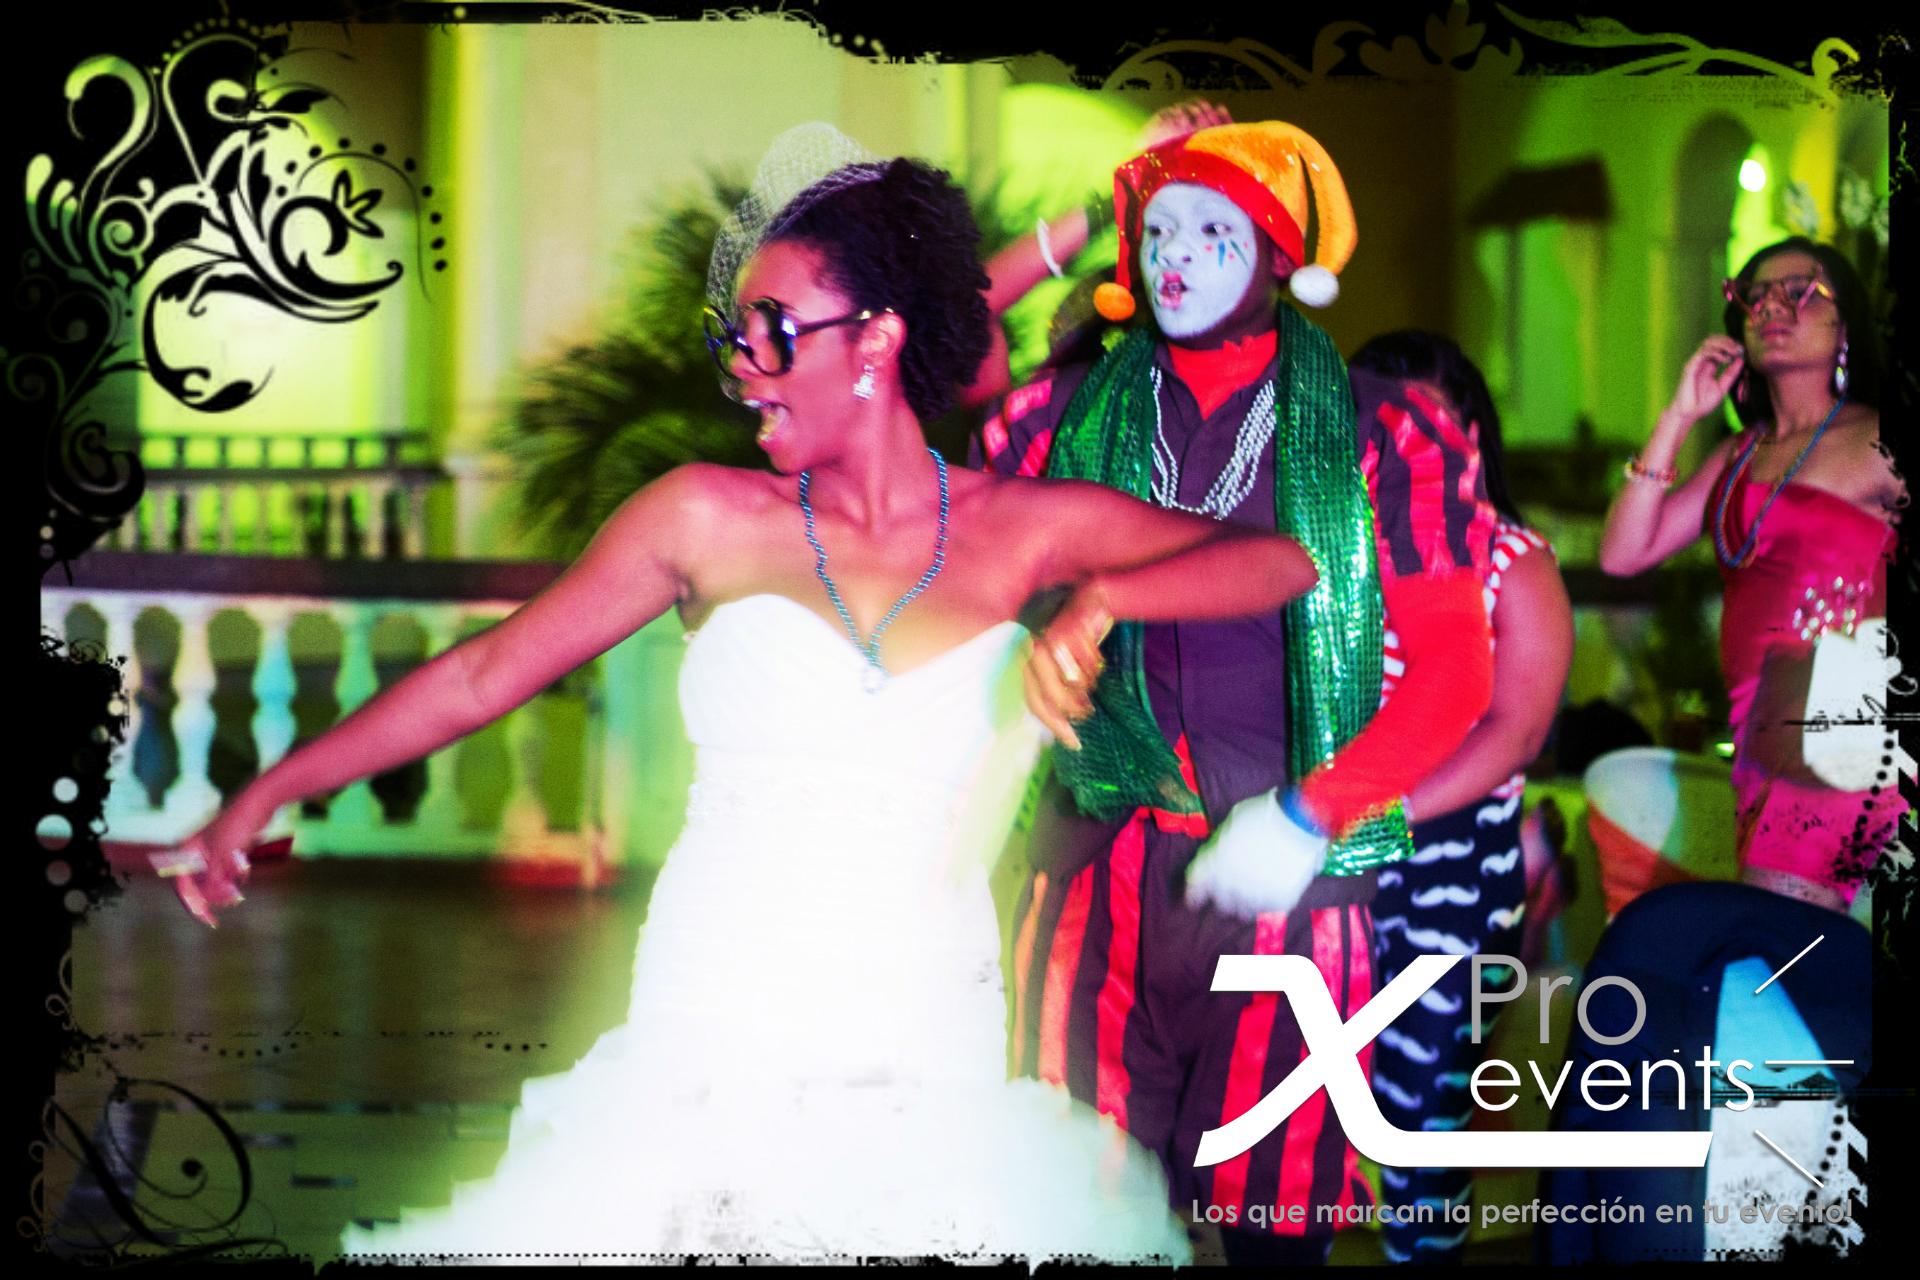 www.Xproevents.com - Ahi se bailo - se brinco - se gozo.jpg